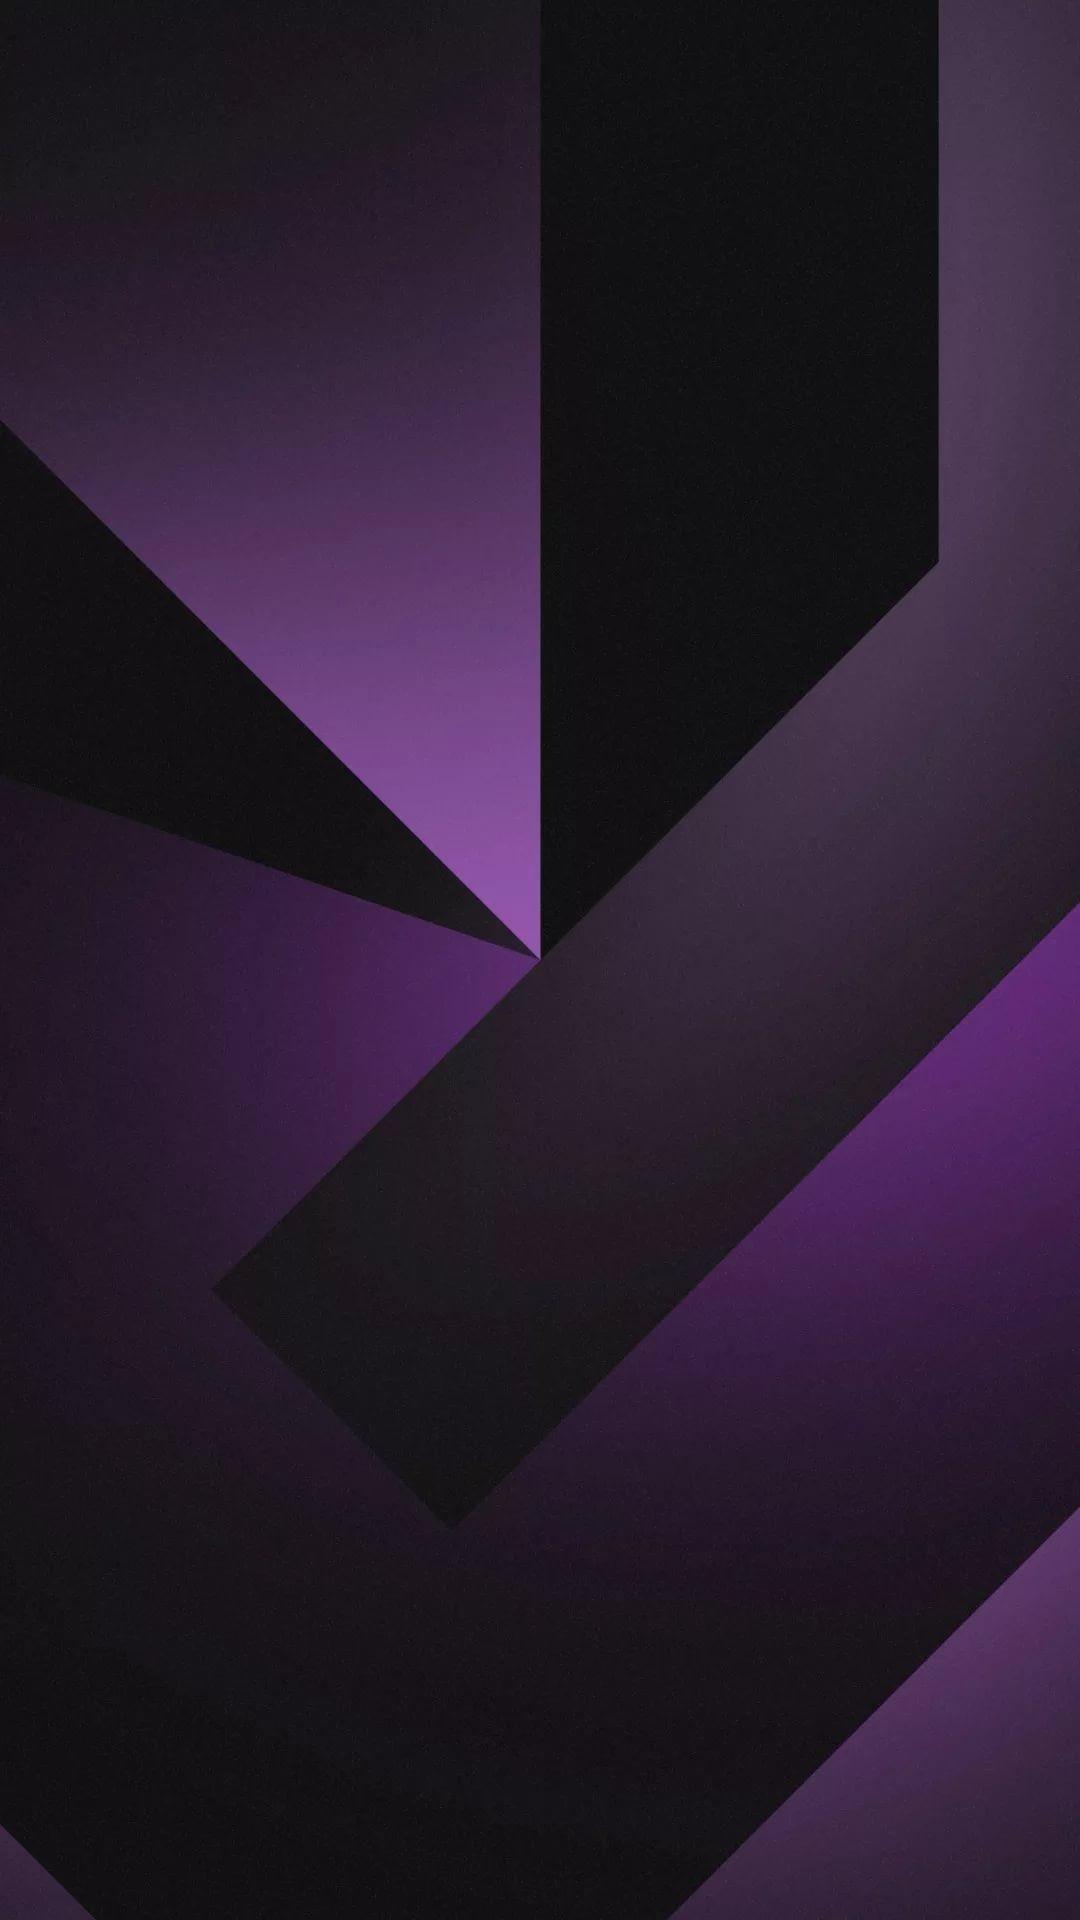 Purple iPhone hd wallpaper